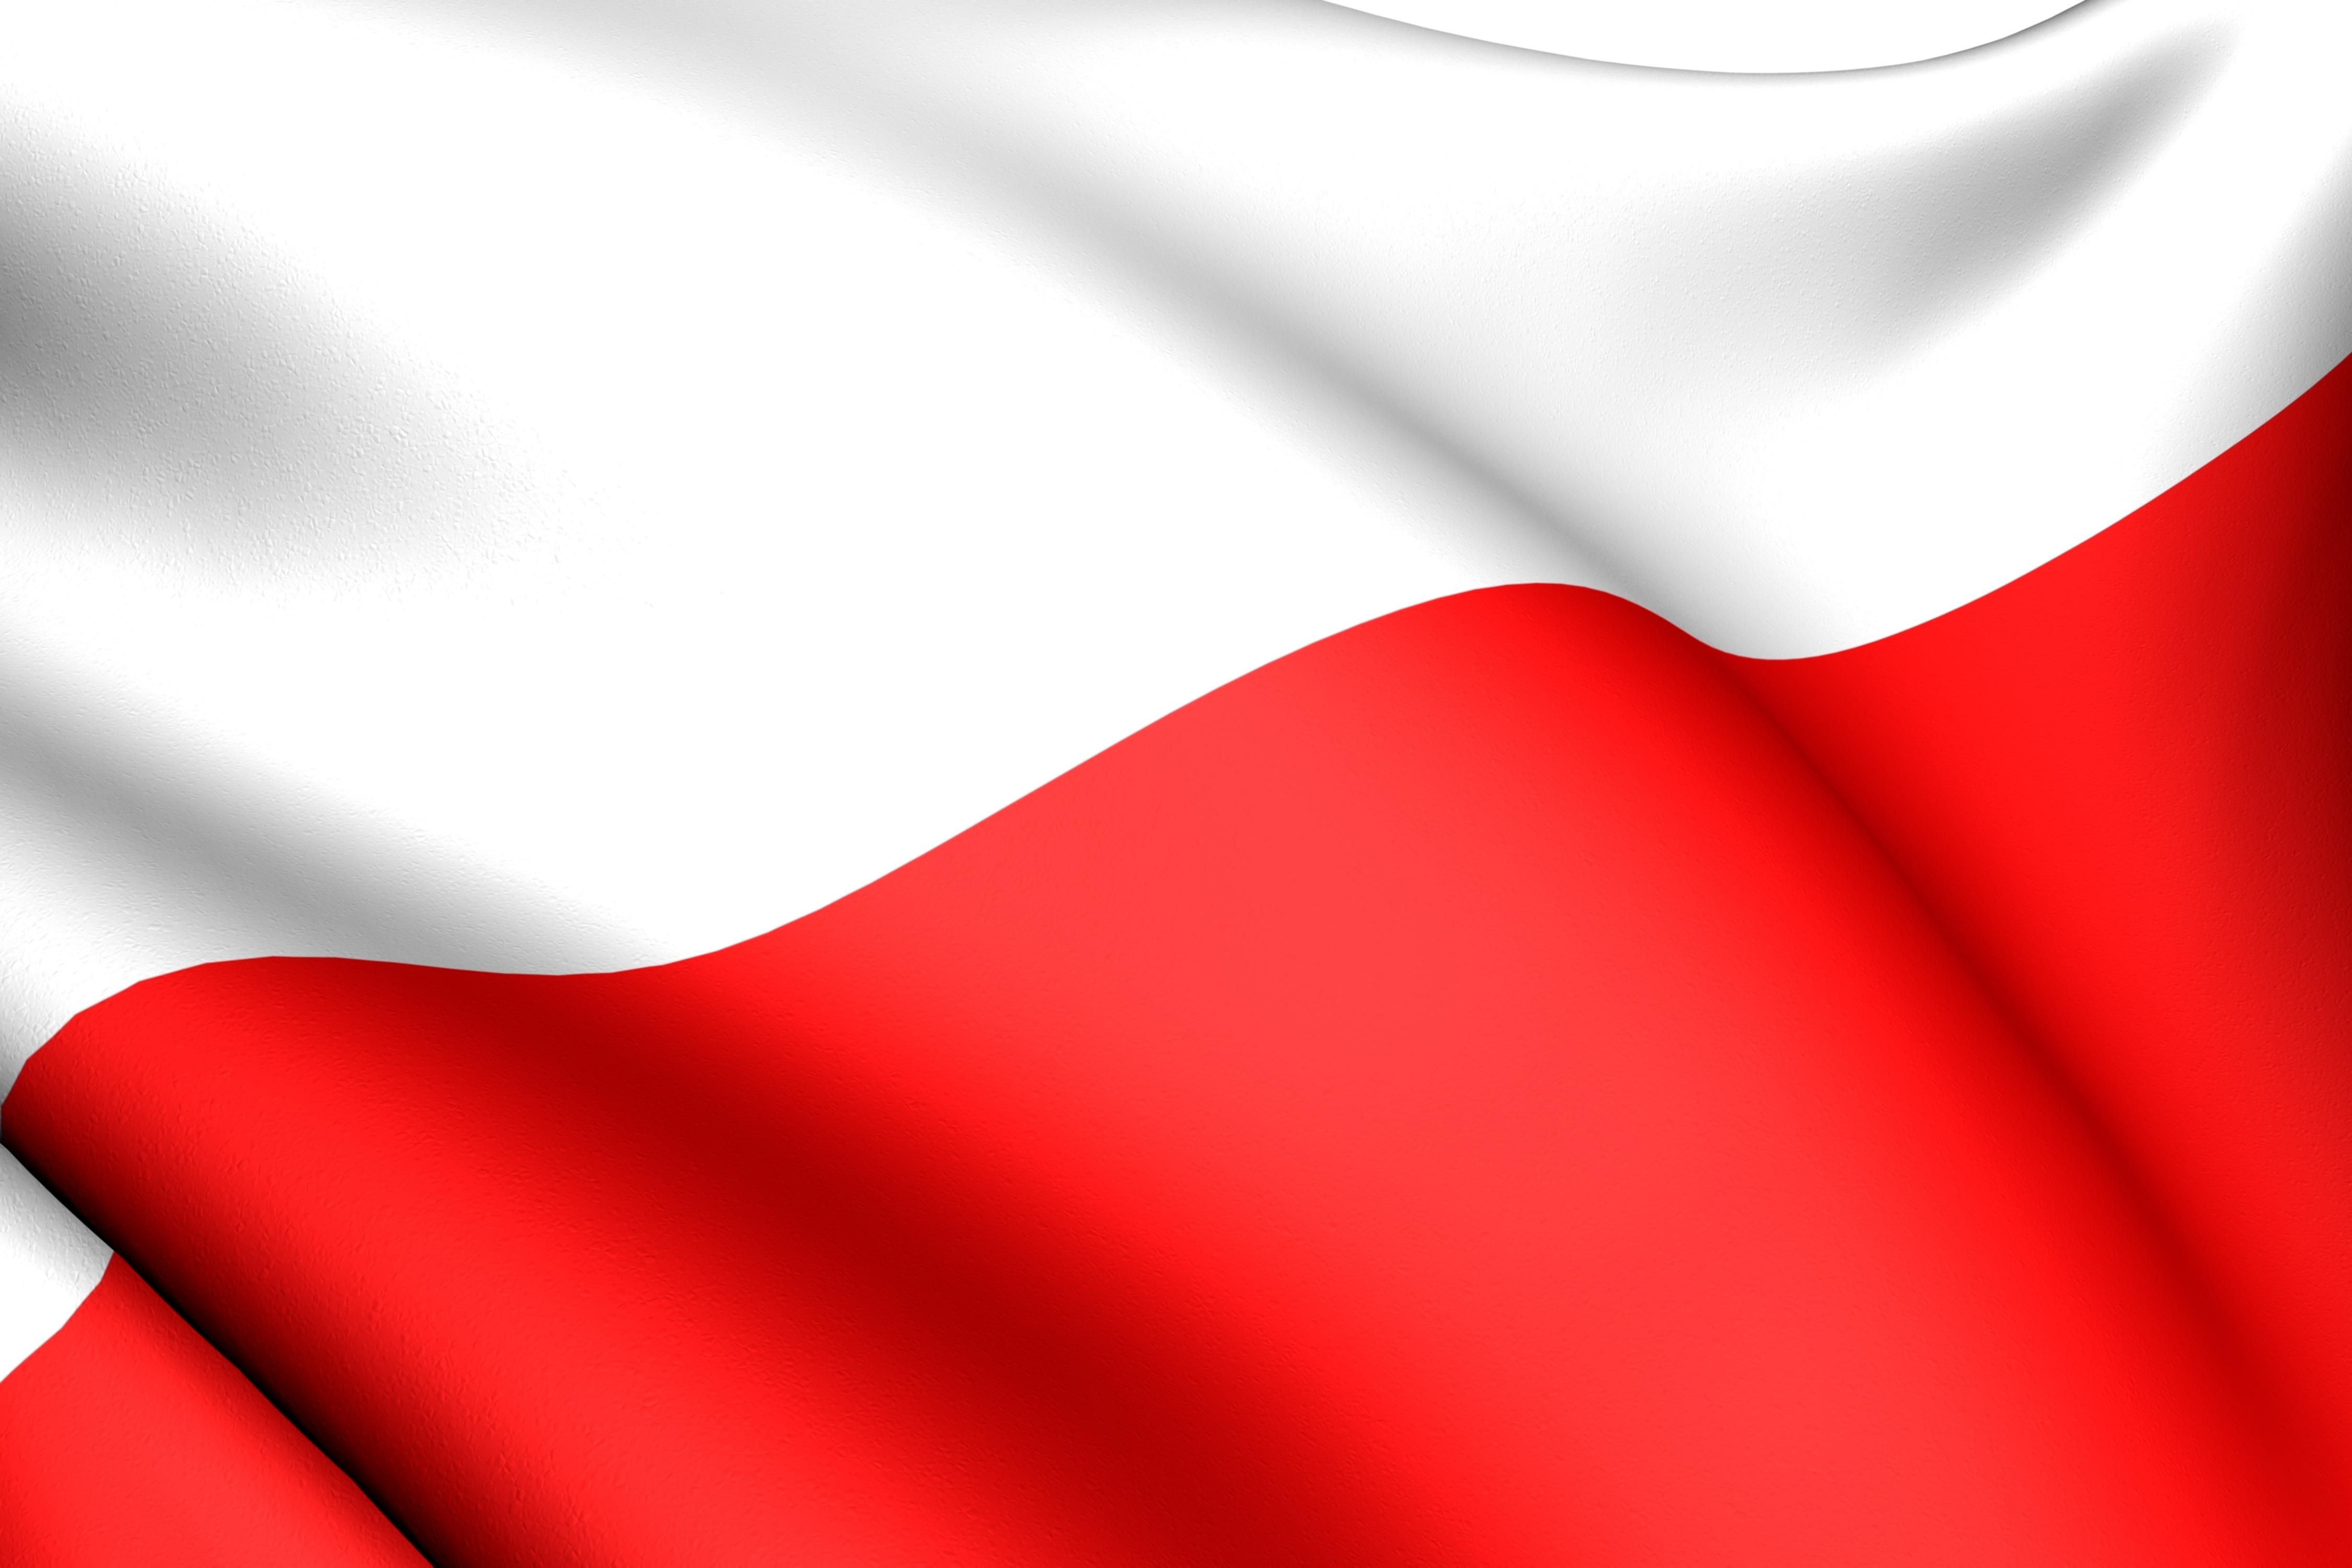 Poland: Ambitious achievers